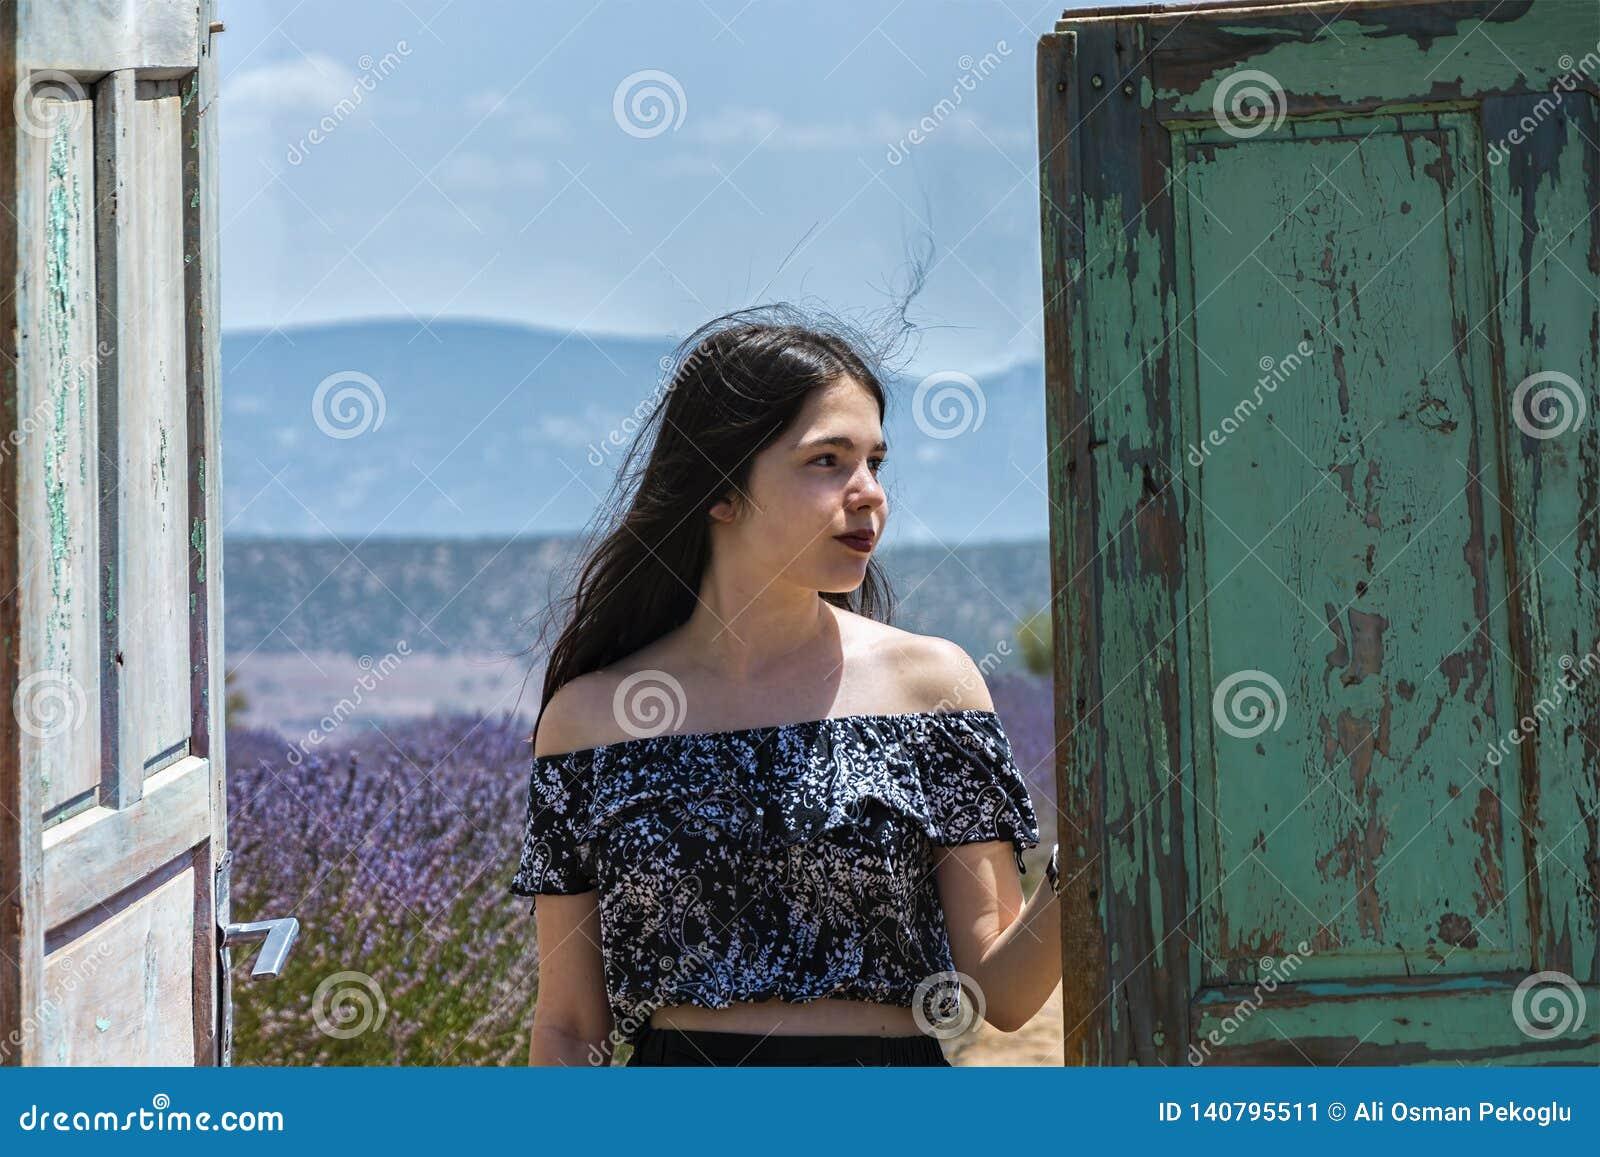 Detrás de la puerta de madera vieja, la chica joven